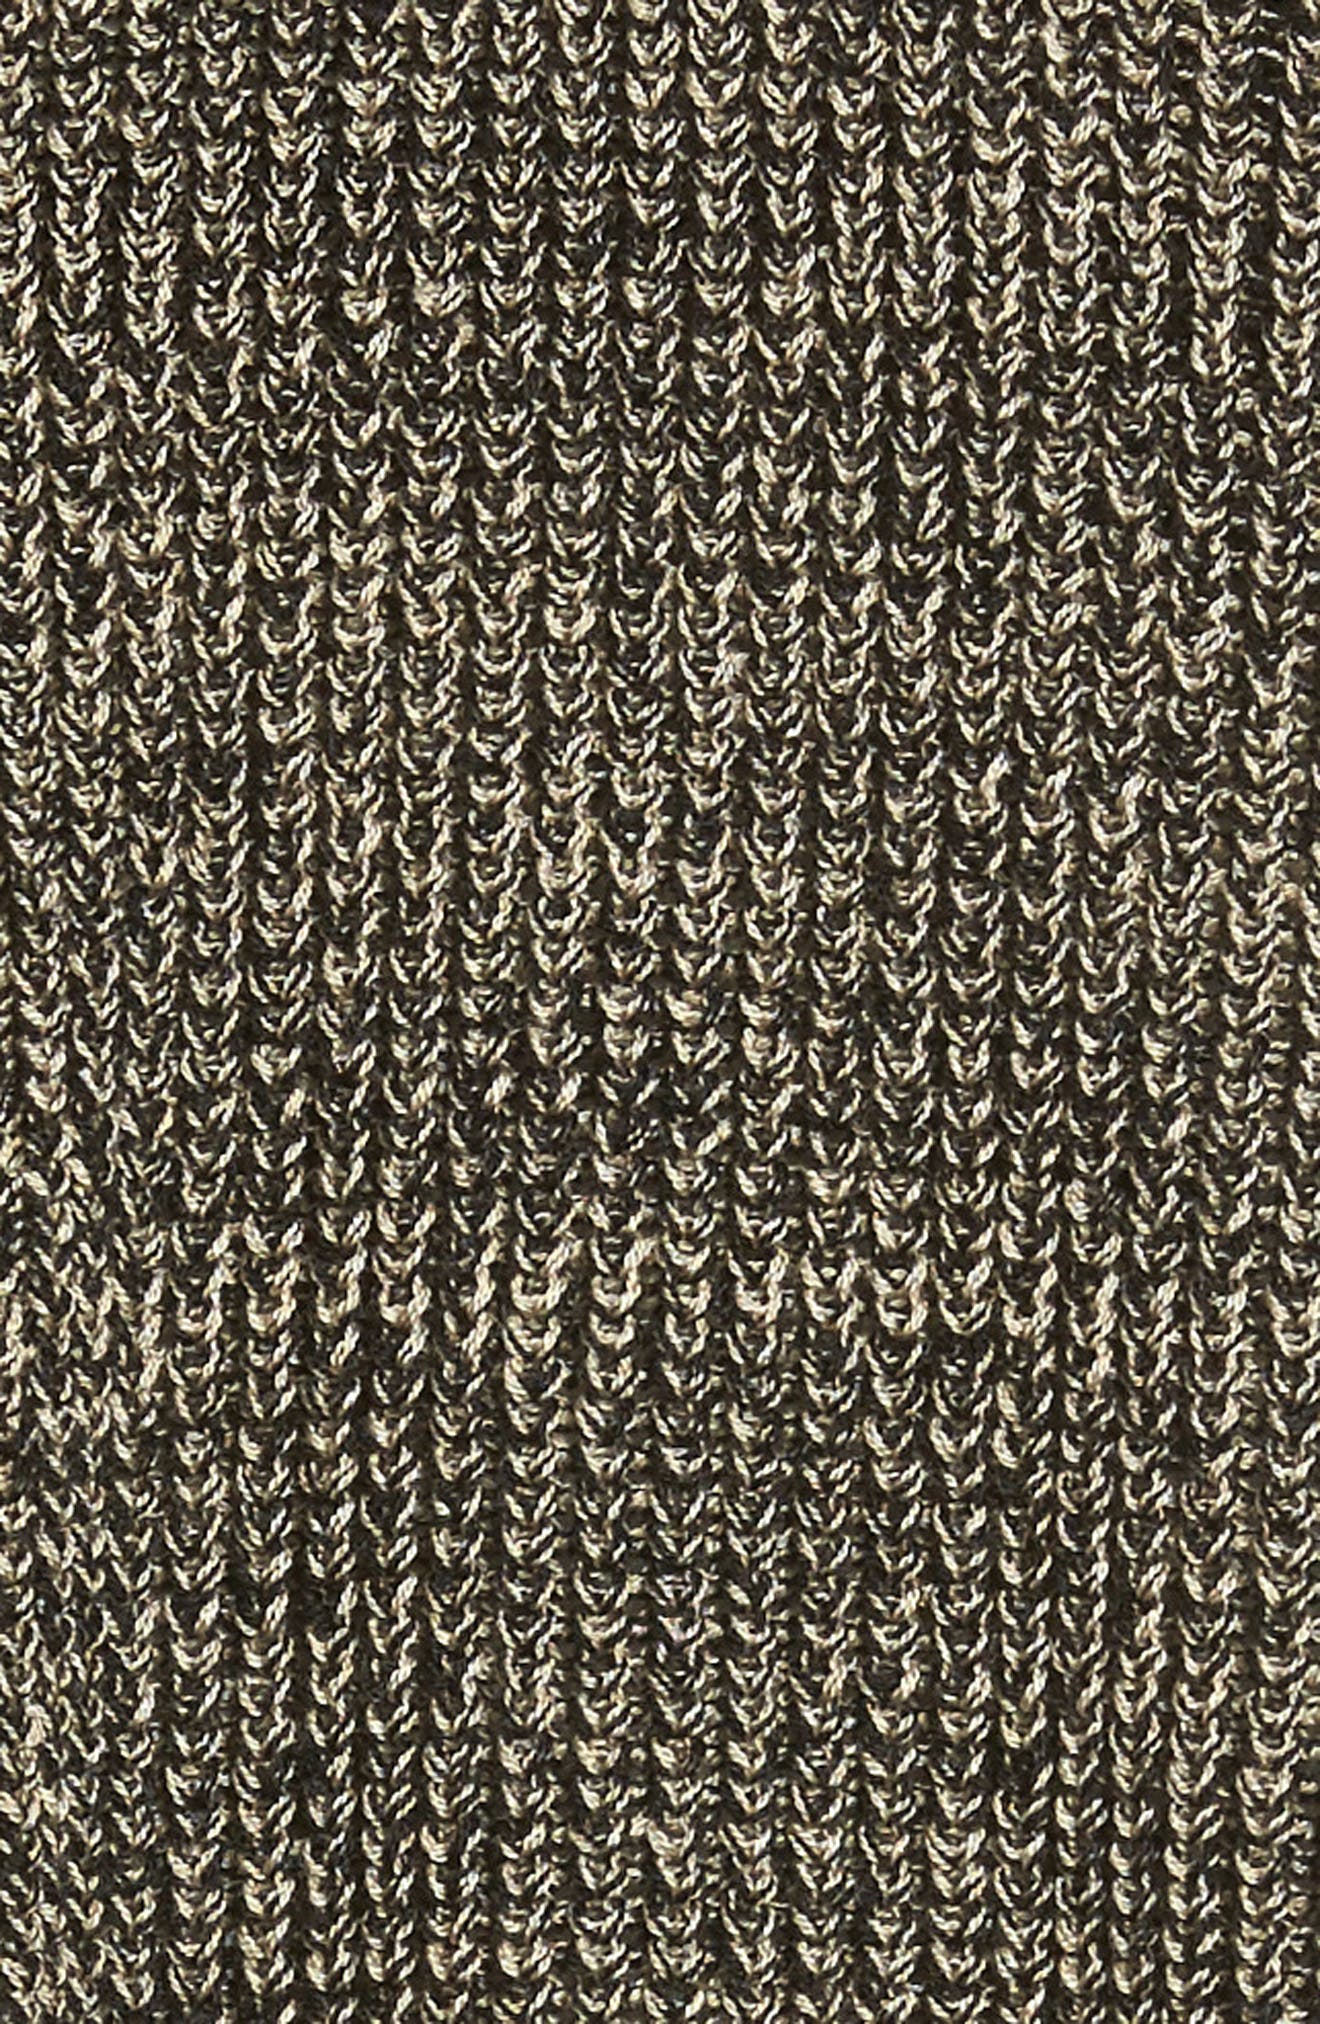 Mélange Knit Tencel<sup>®</sup> Crop Sweater,                             Alternate thumbnail 5, color,                             Black Natural